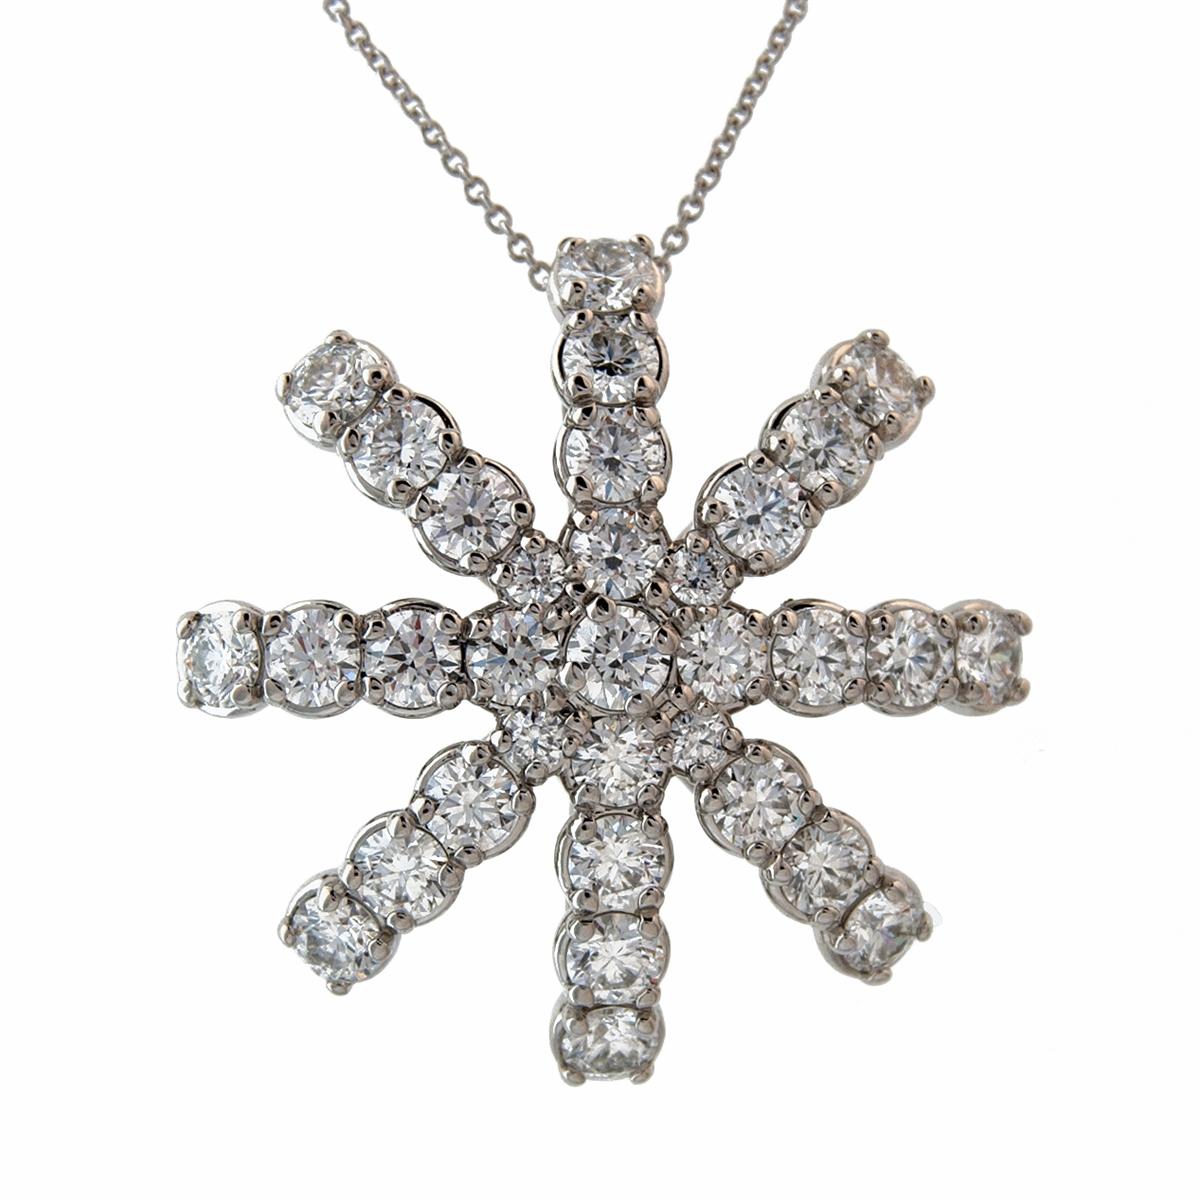 J briggs co hopestar 290ct diamond pendant necklace hopestar 290ct diamond pendant necklace mozeypictures Image collections